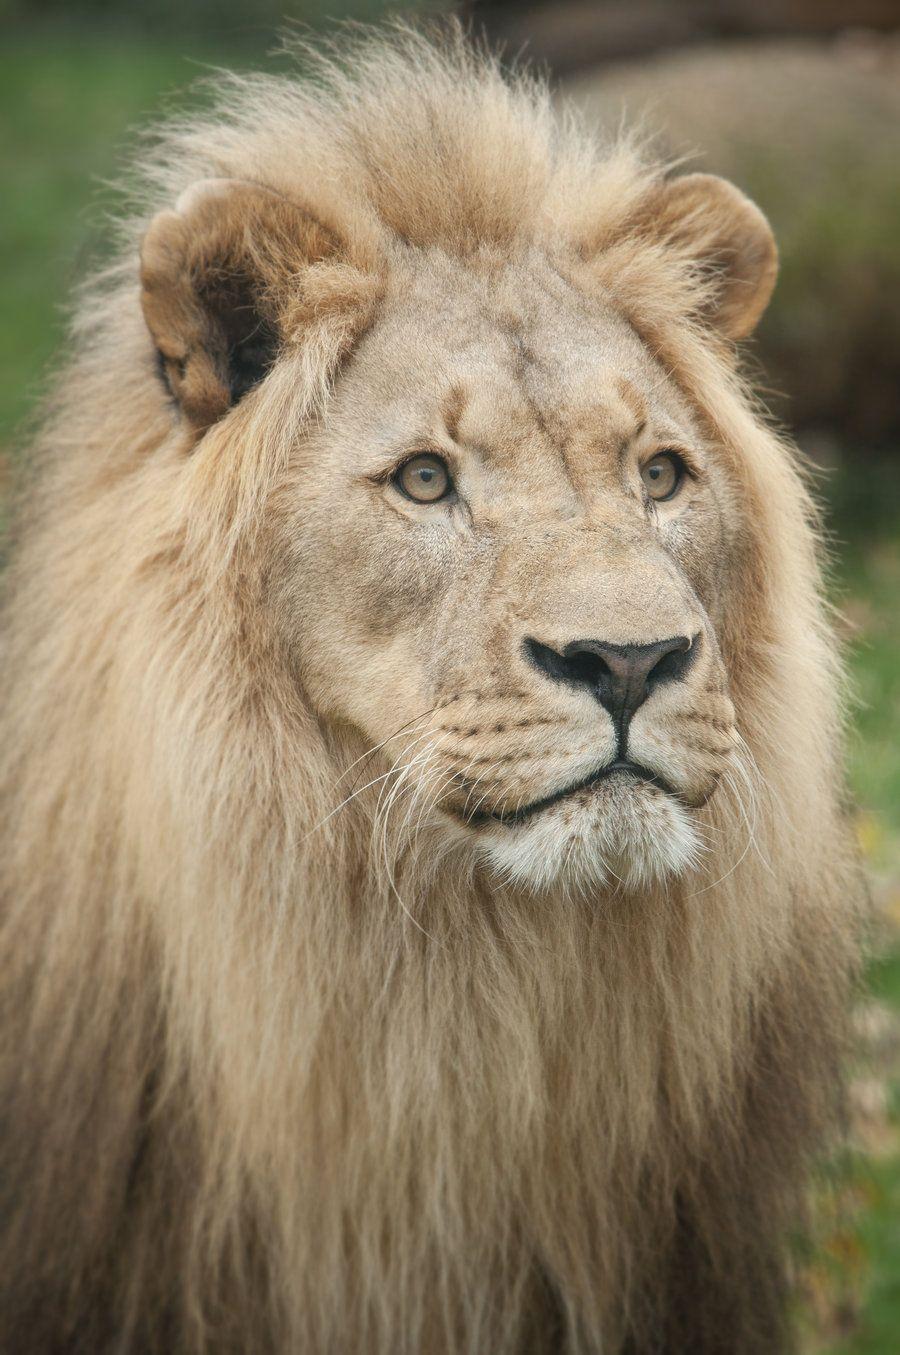 Lion, Salzburg I by GW-Photography.deviantart.com on @deviantART